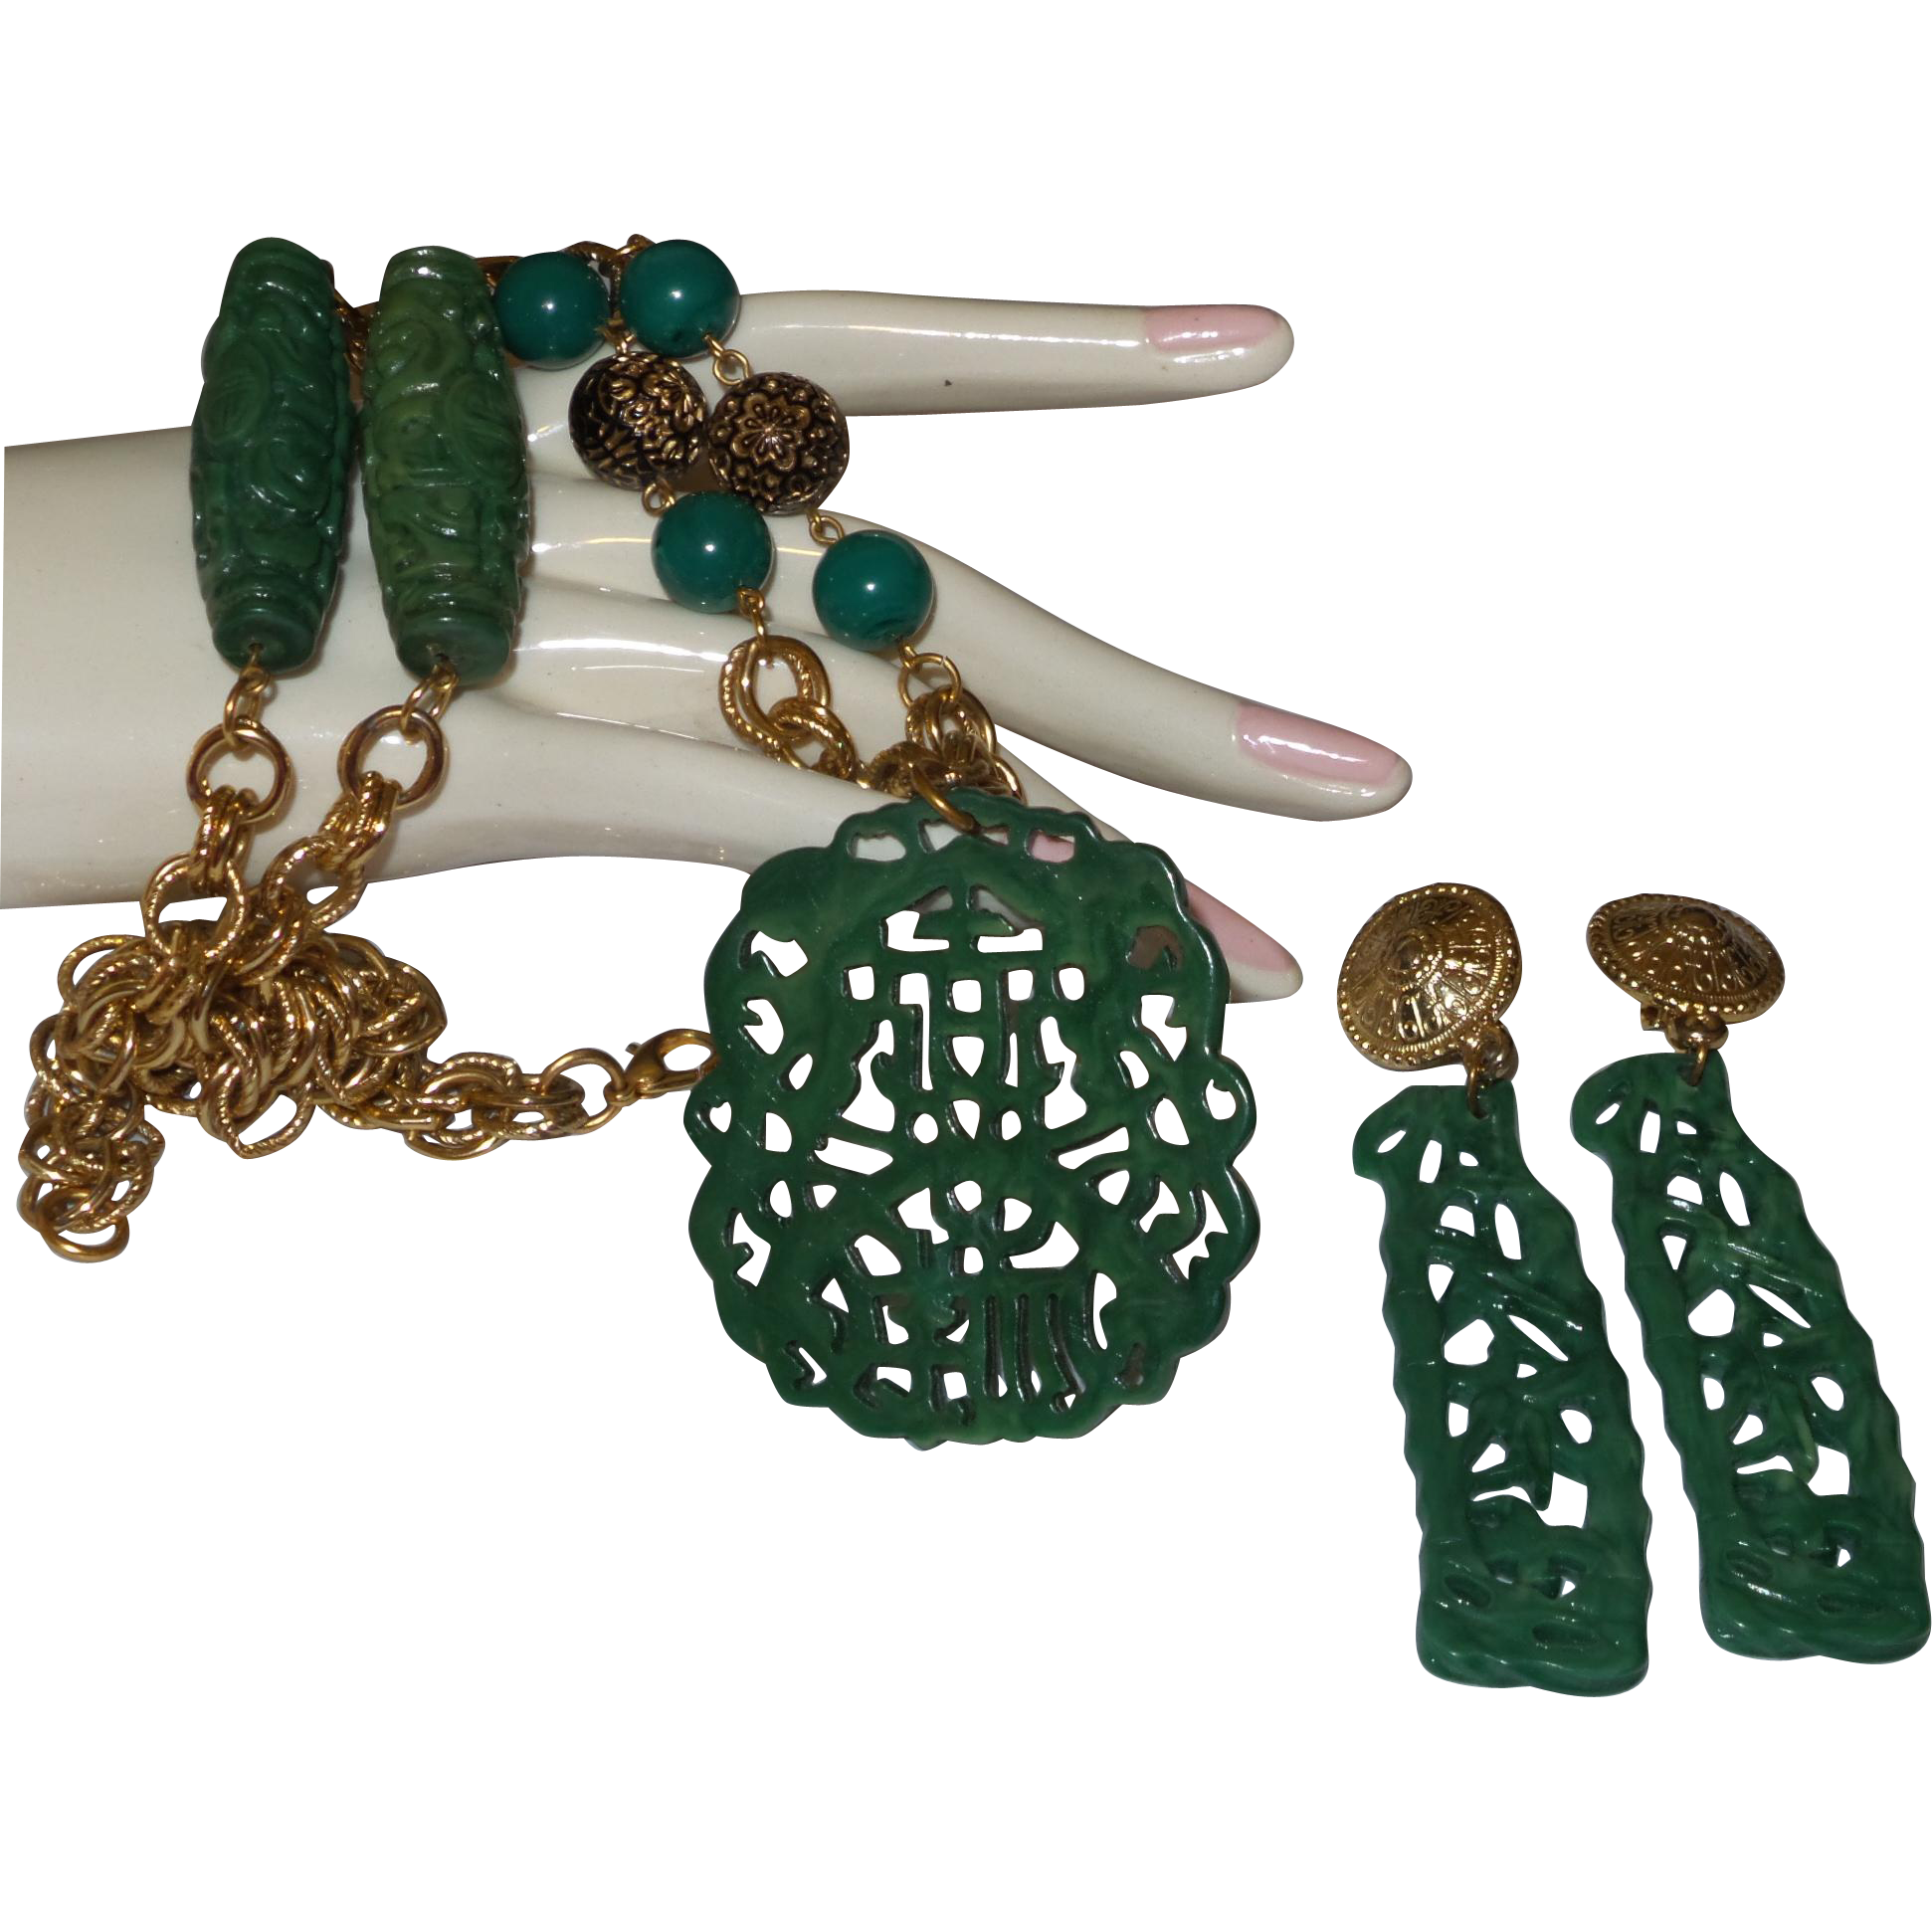 Vintage Faux Green Jade Necklace/Earrings From Pearlgirls